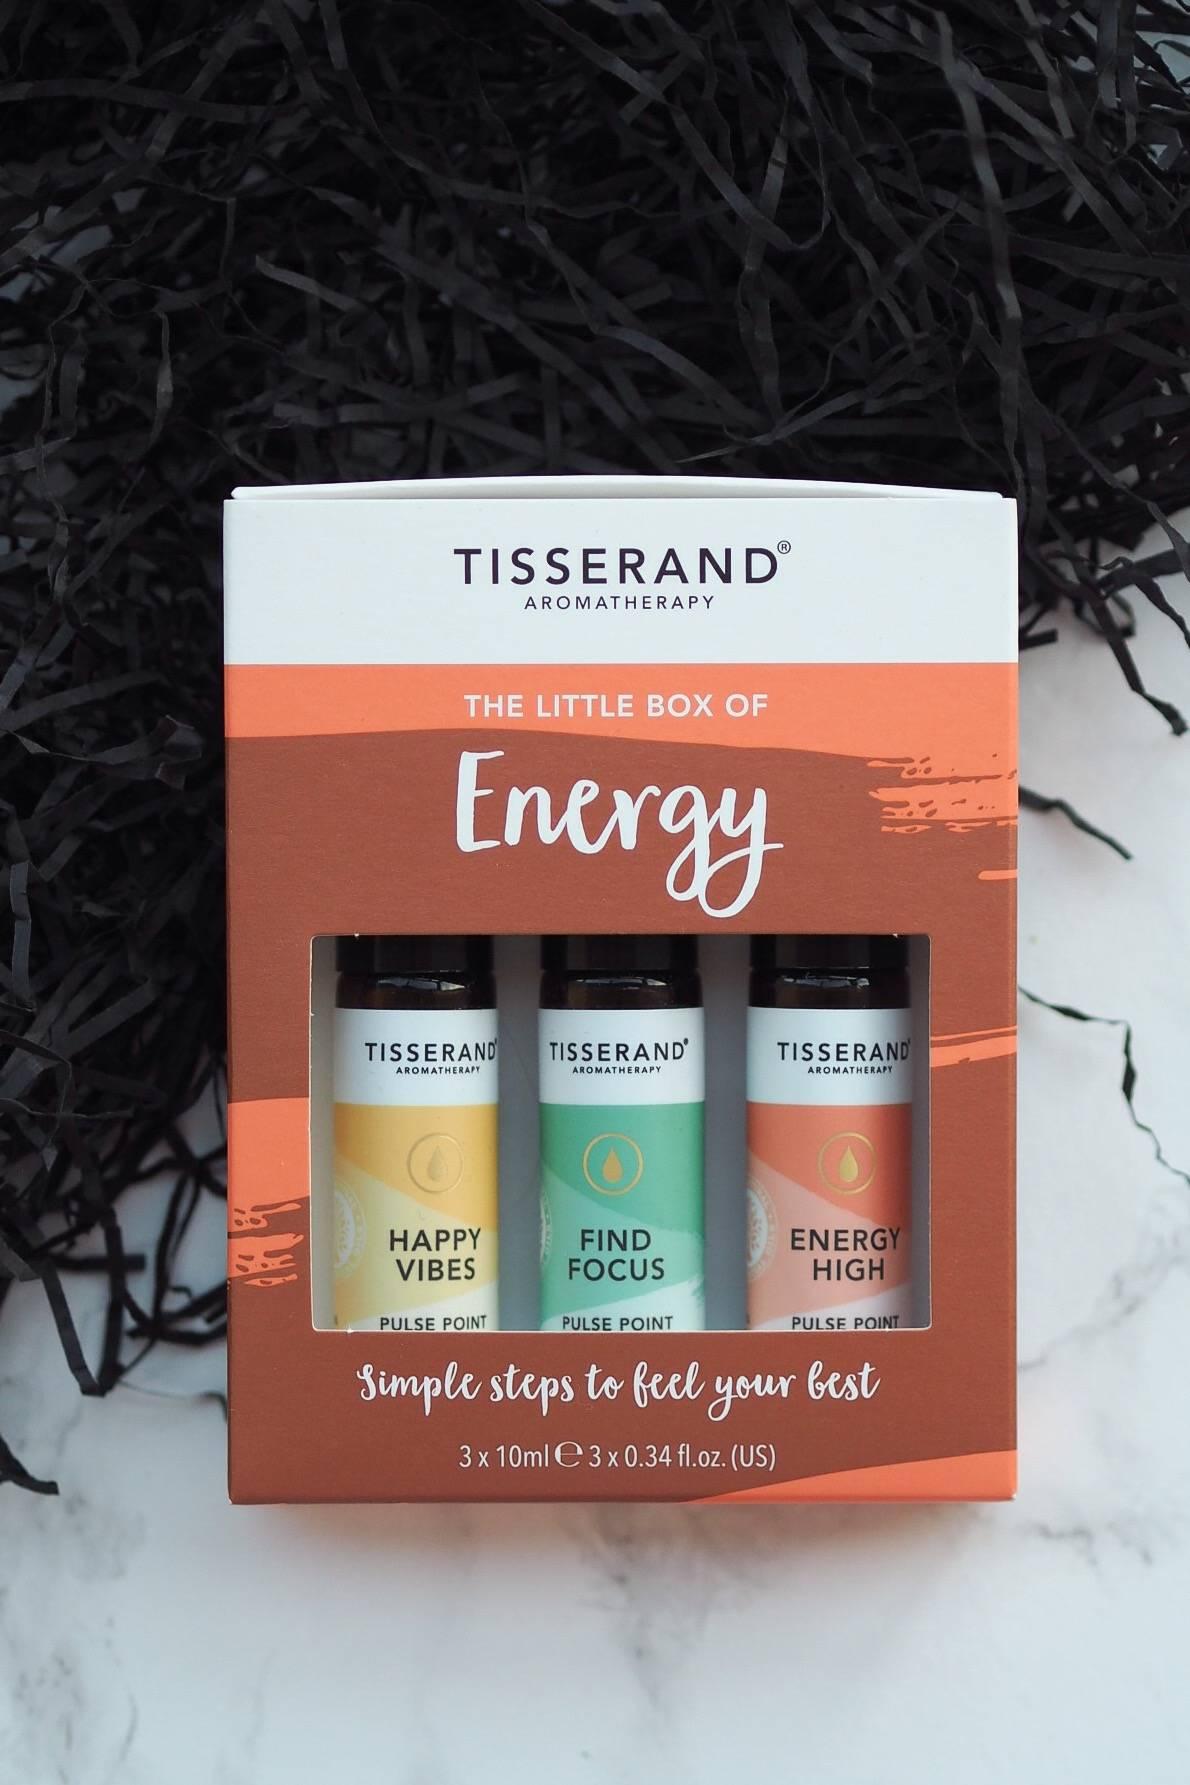 GSxSophieetc_Tisserand_LIttle_Box_of_Energy(1)